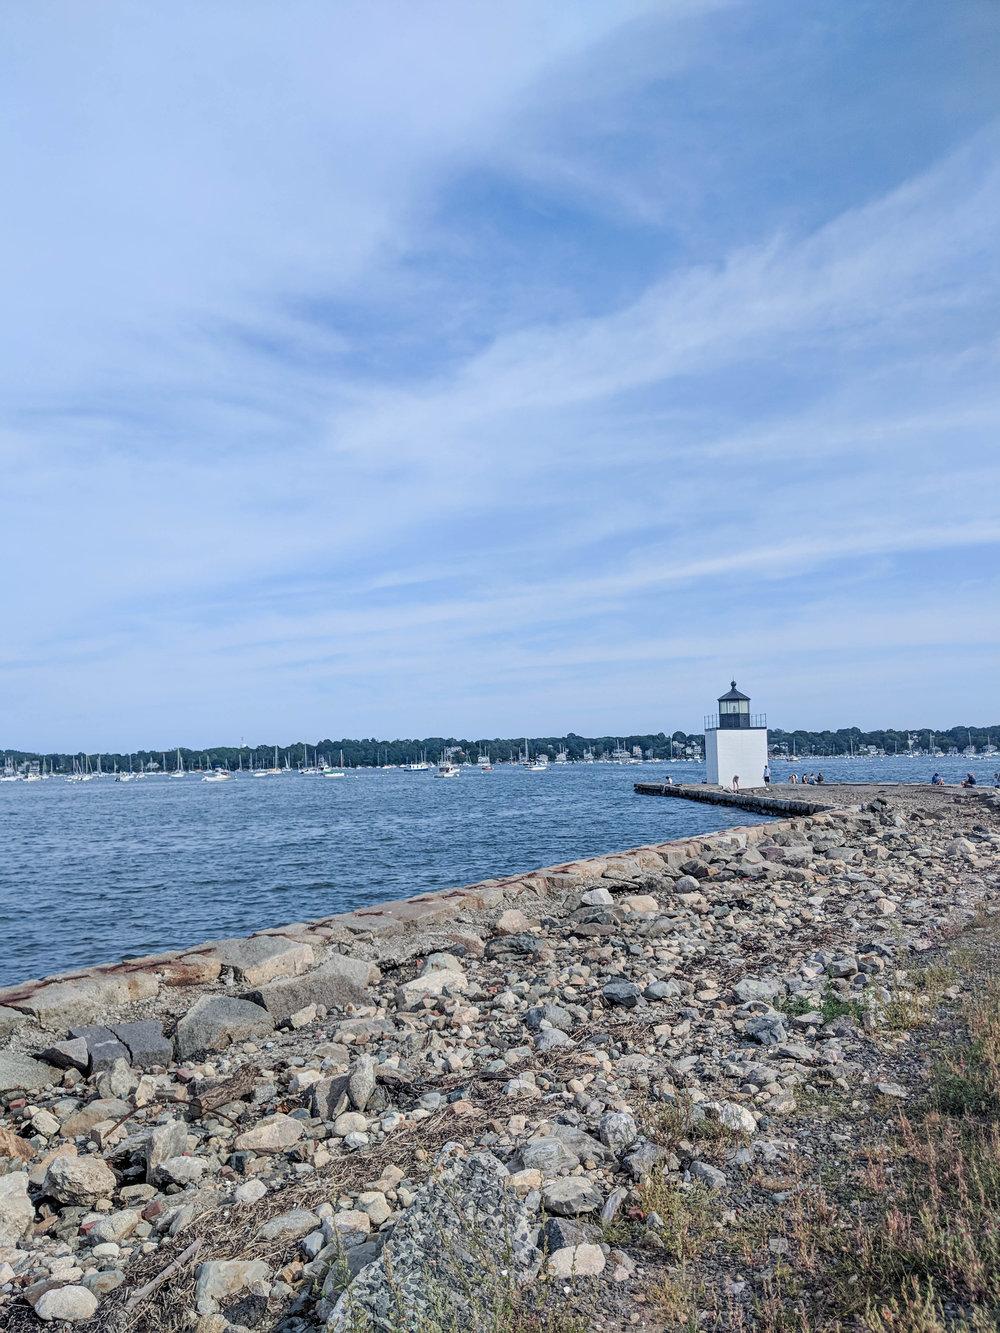 bri rinehart; photography; salem; derby wharf lighthouse